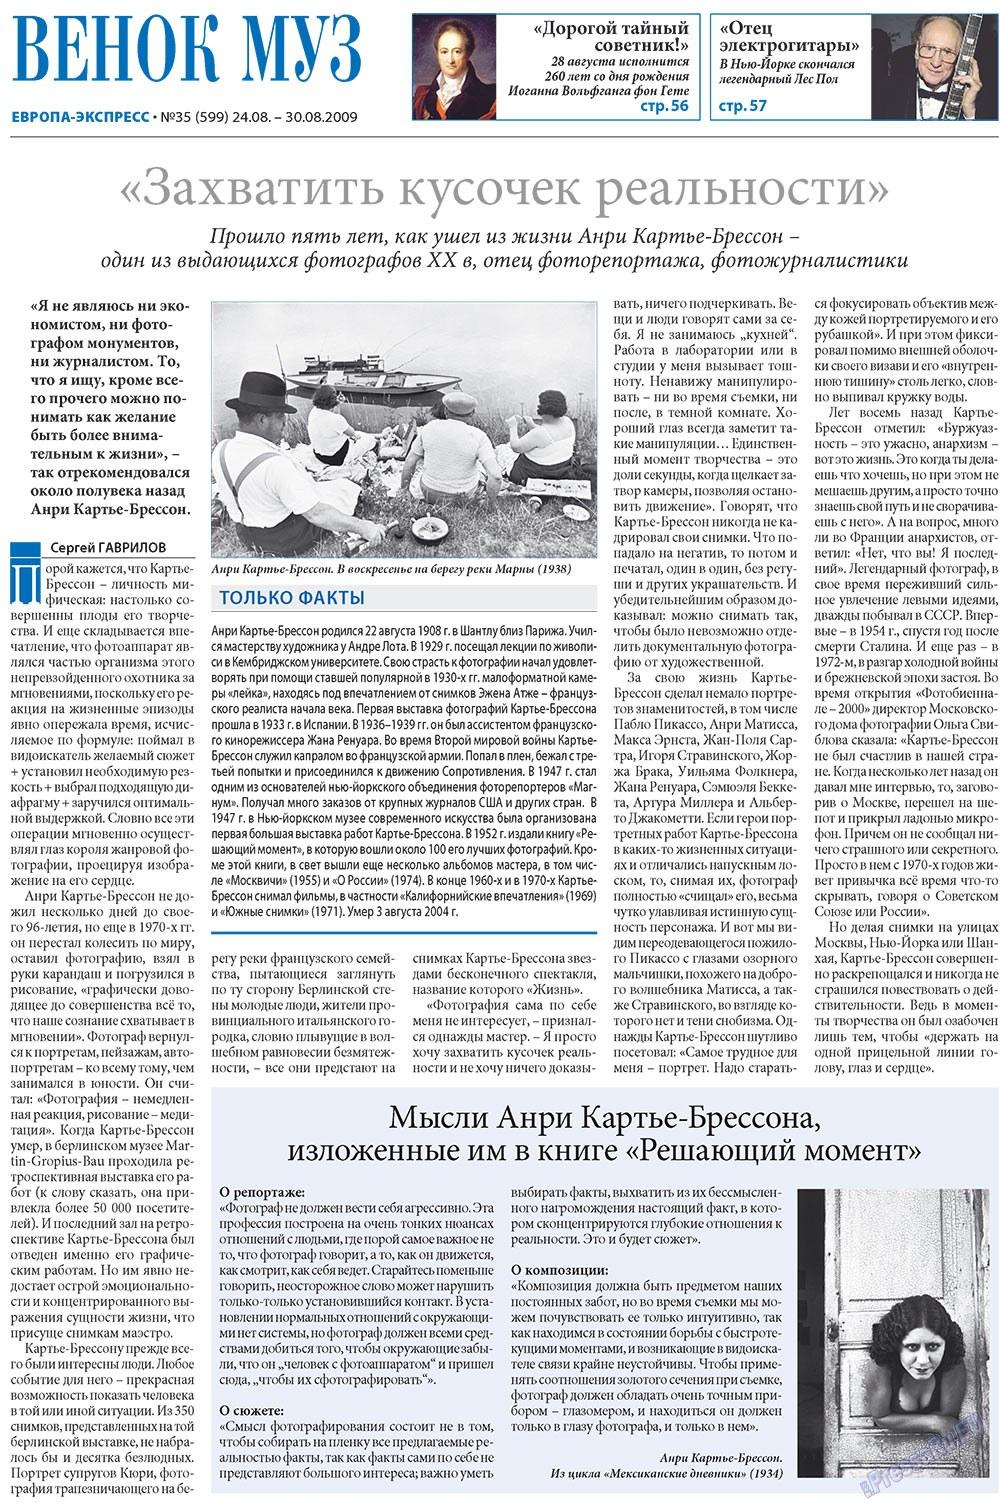 Европа экспресс (газета). 2009 год, номер 35, стр. 15